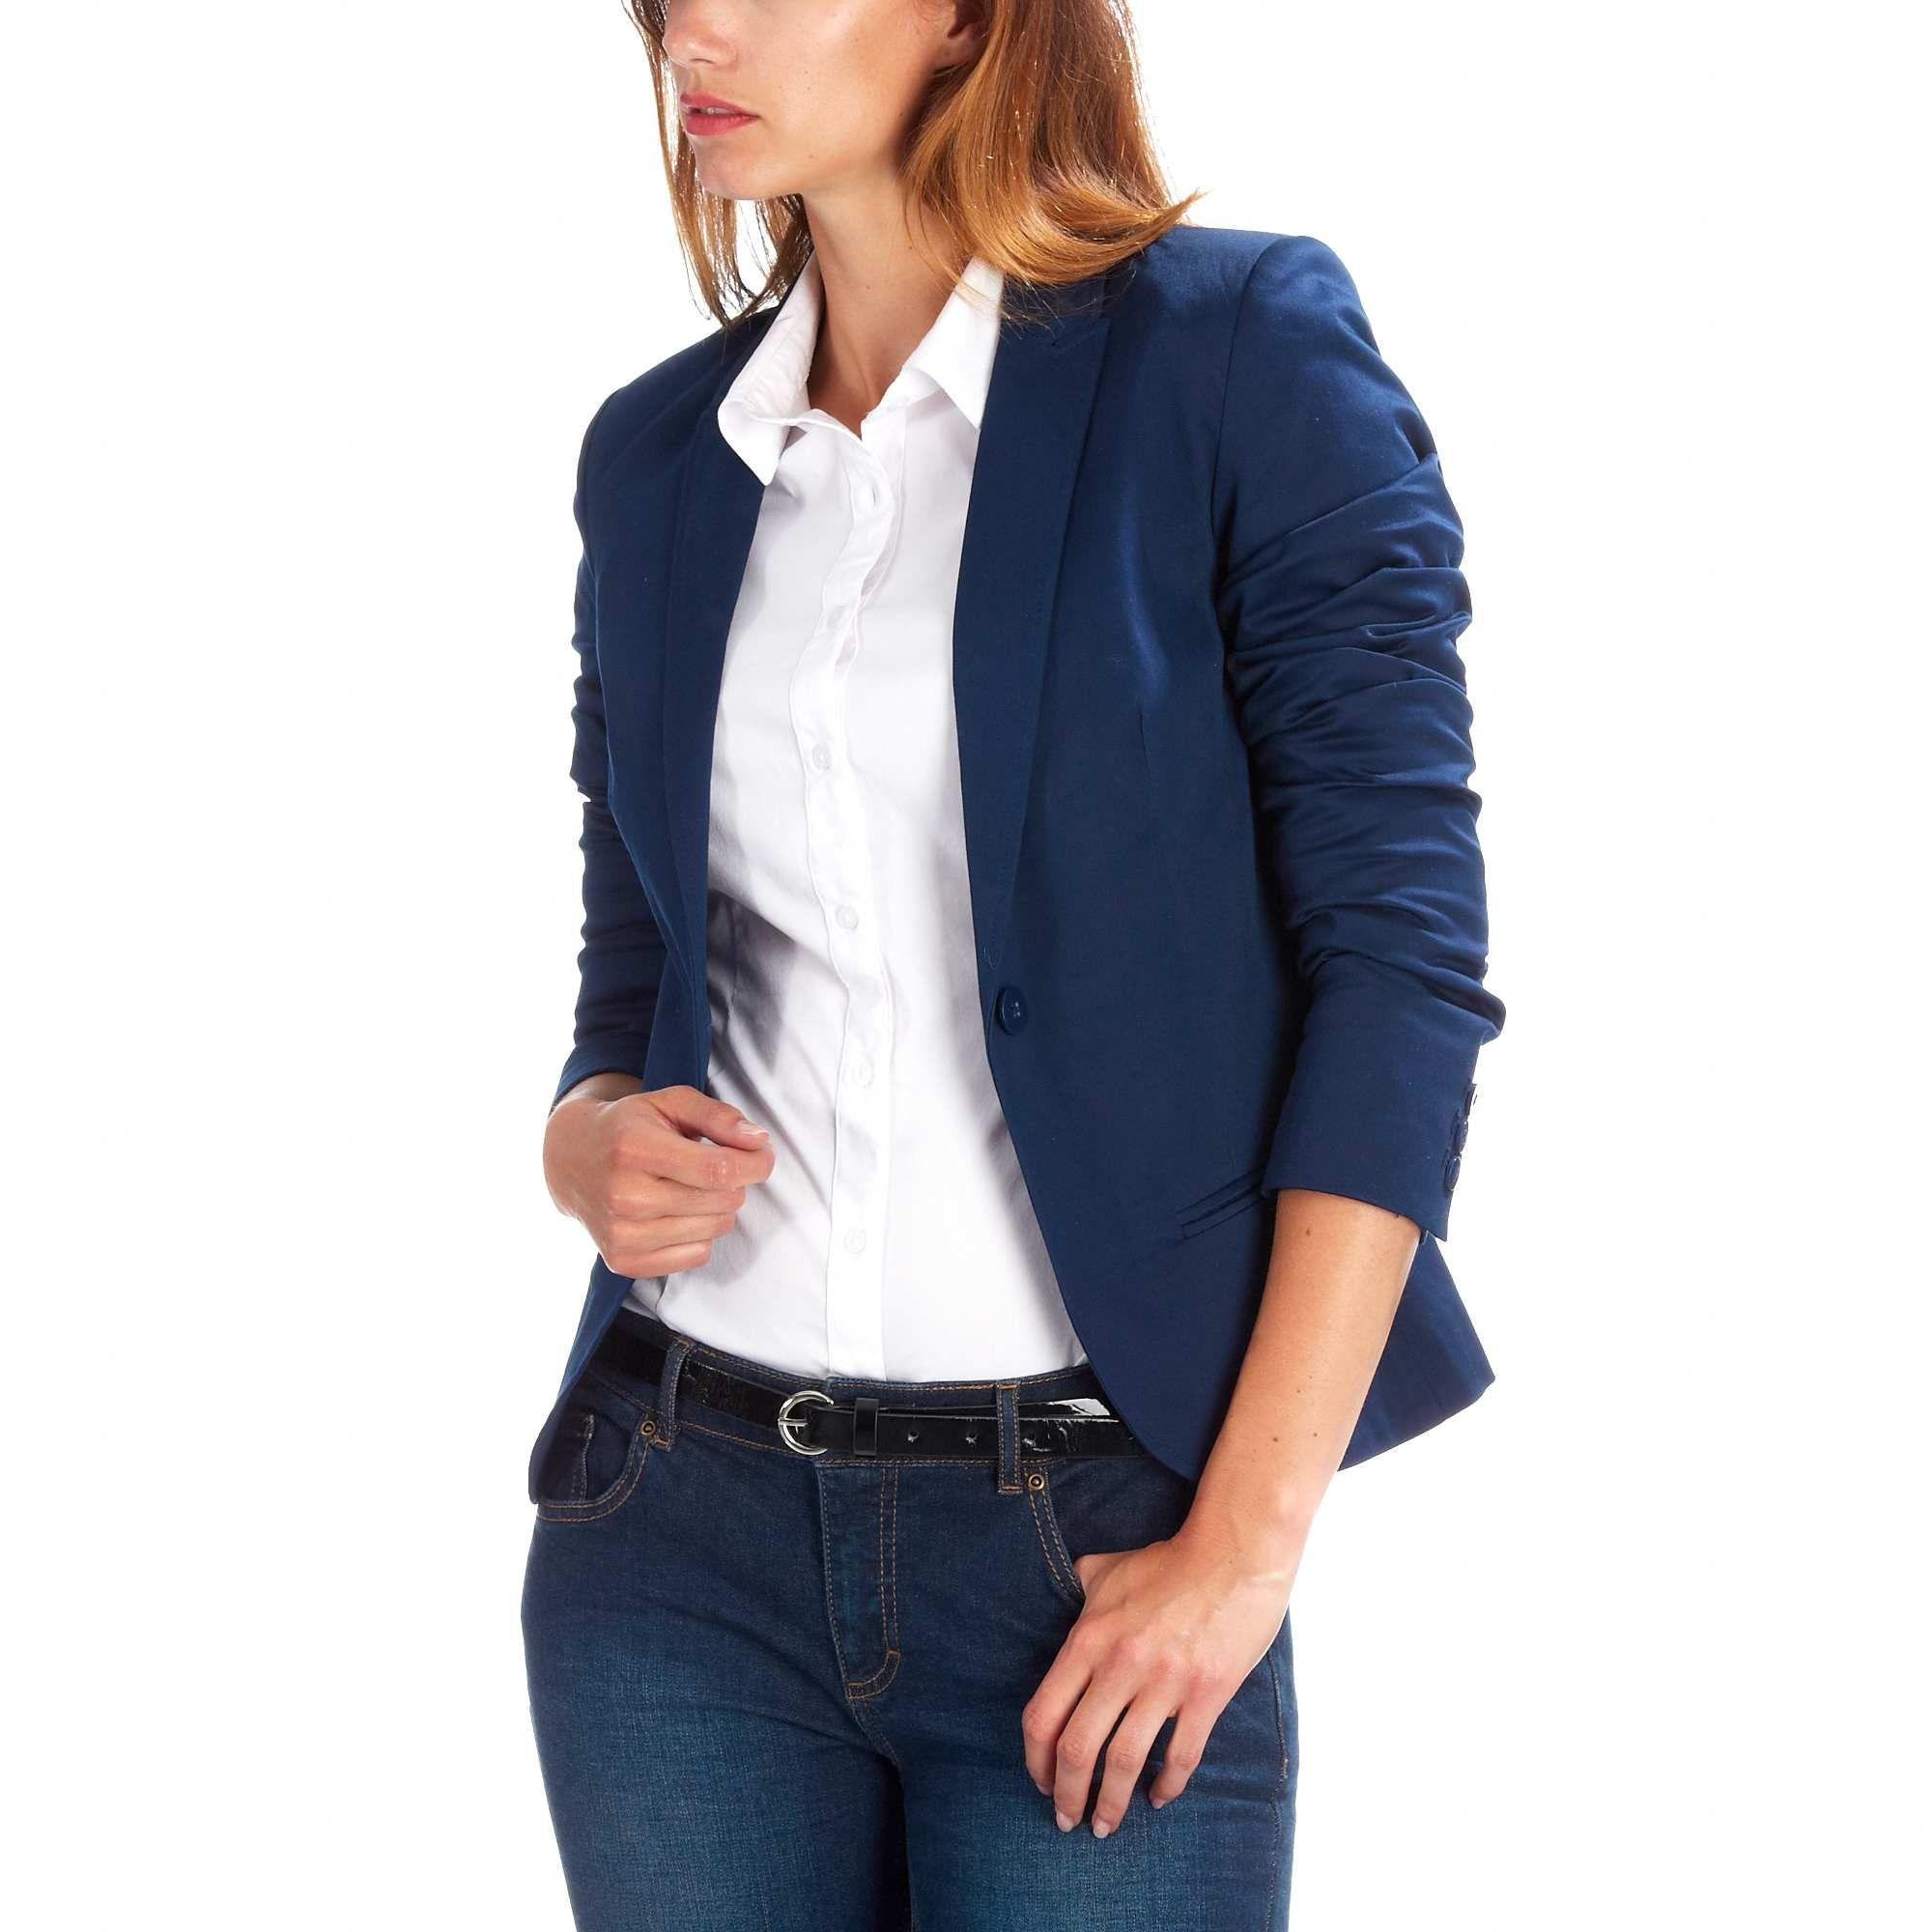 Veste bleu marine femme kiabi